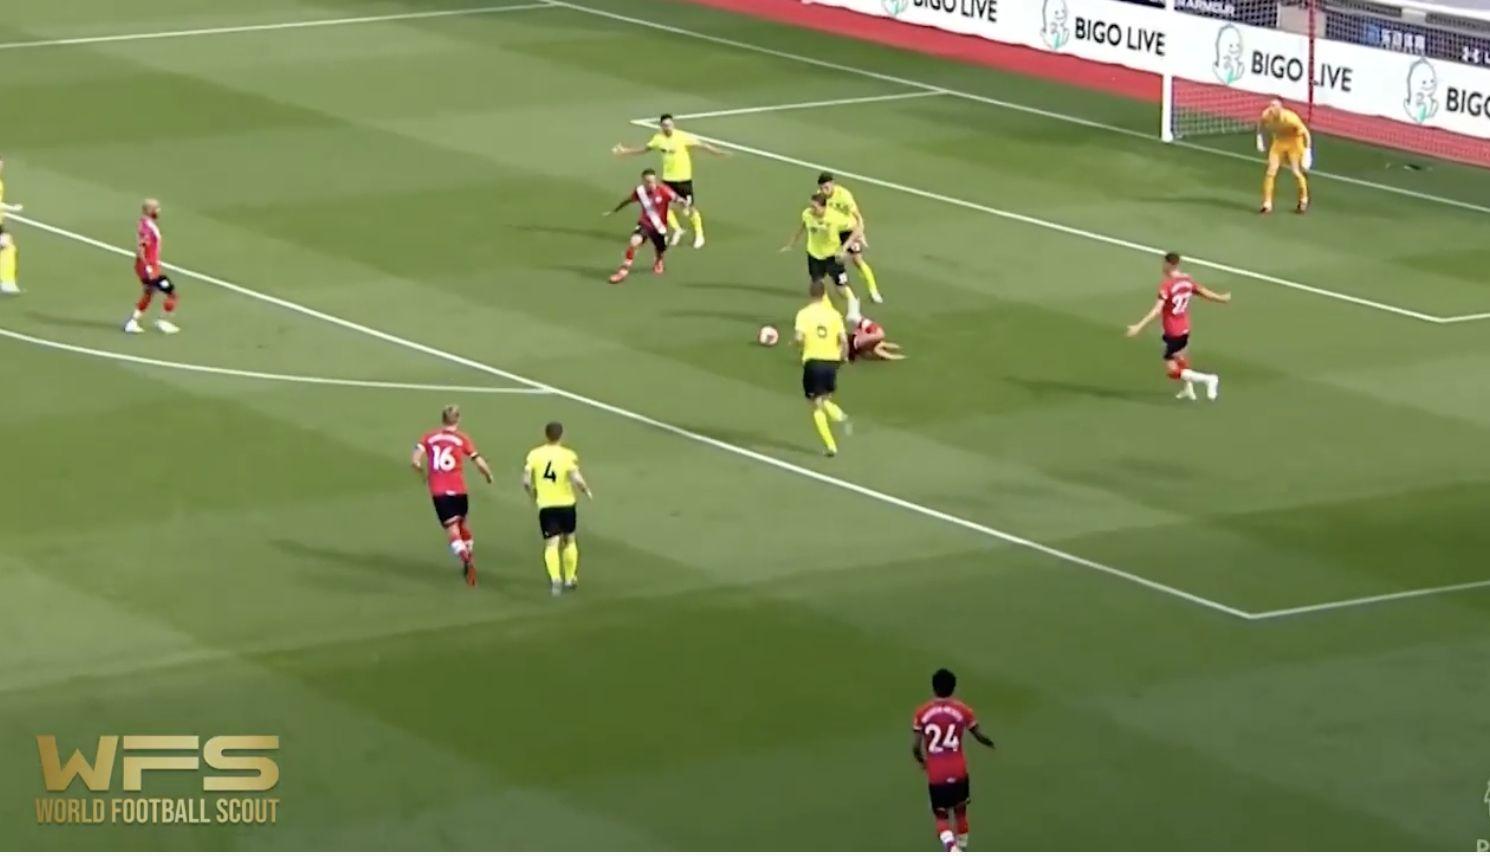 (Video) Sander Berge's Best Bits, as Liverpool consider giant soon-to-be-relegated midfielder